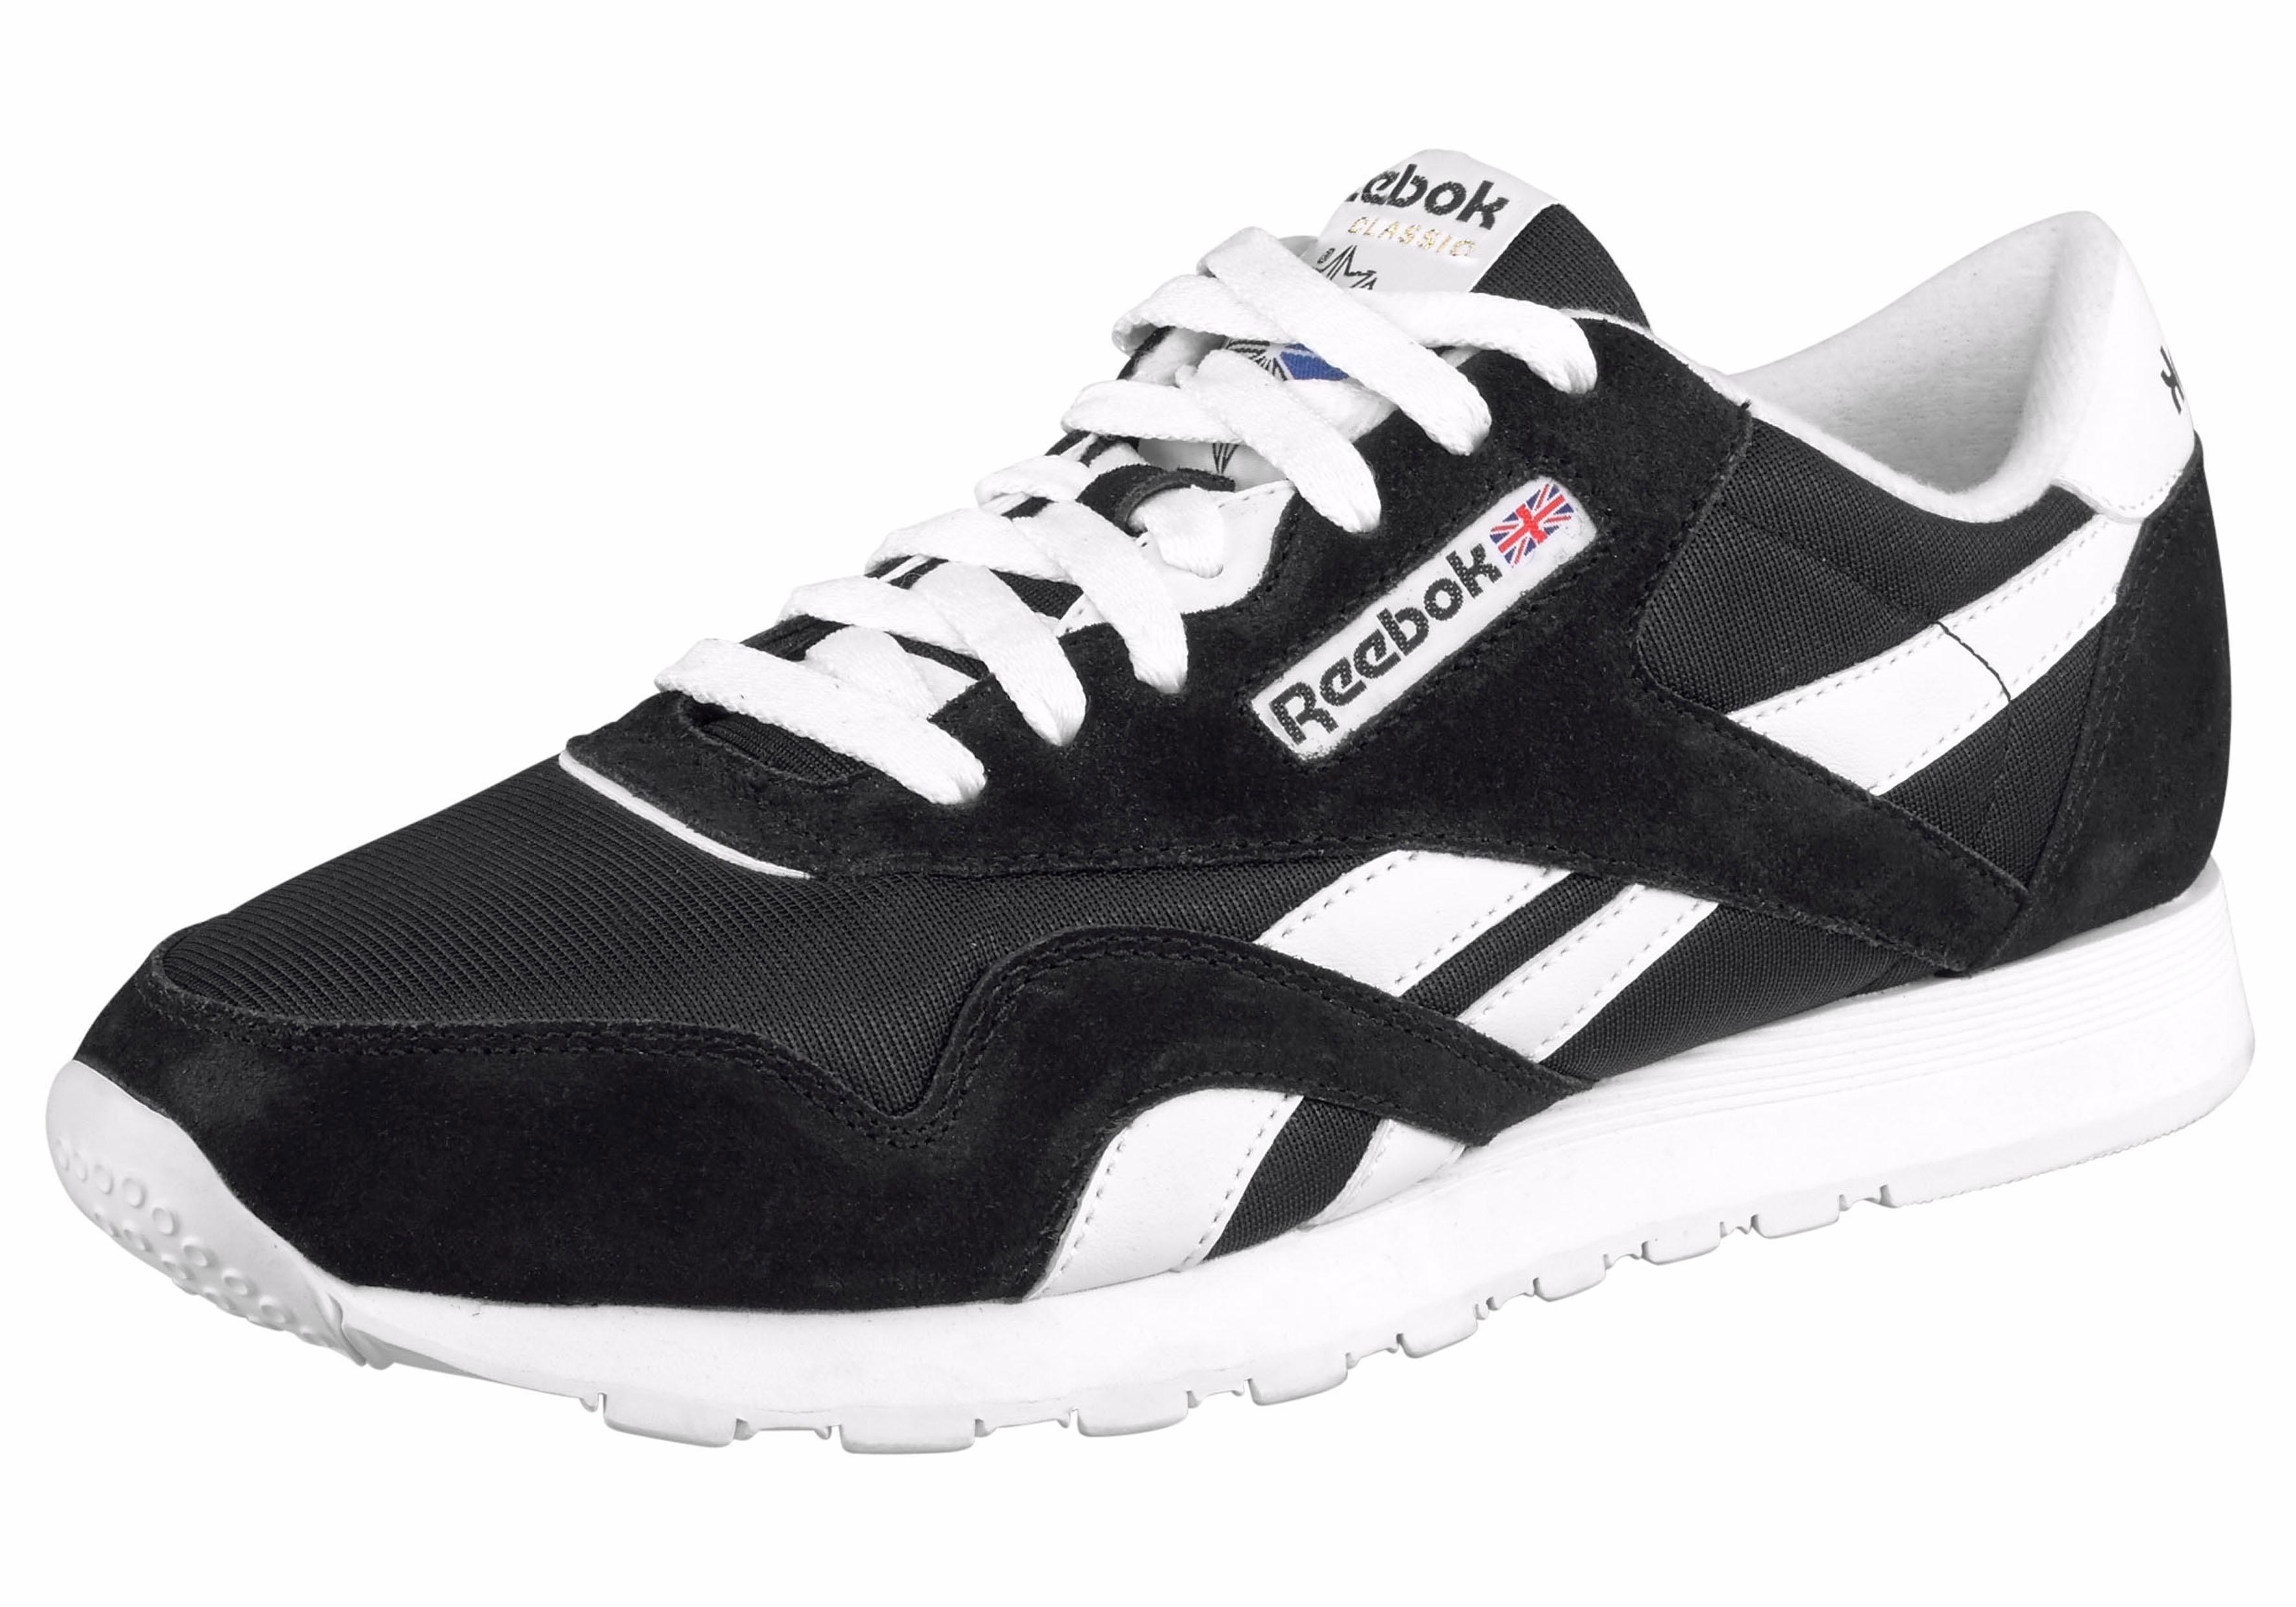 Reebok Classic »Nylon M« Sneaker online kaufen | OTTO